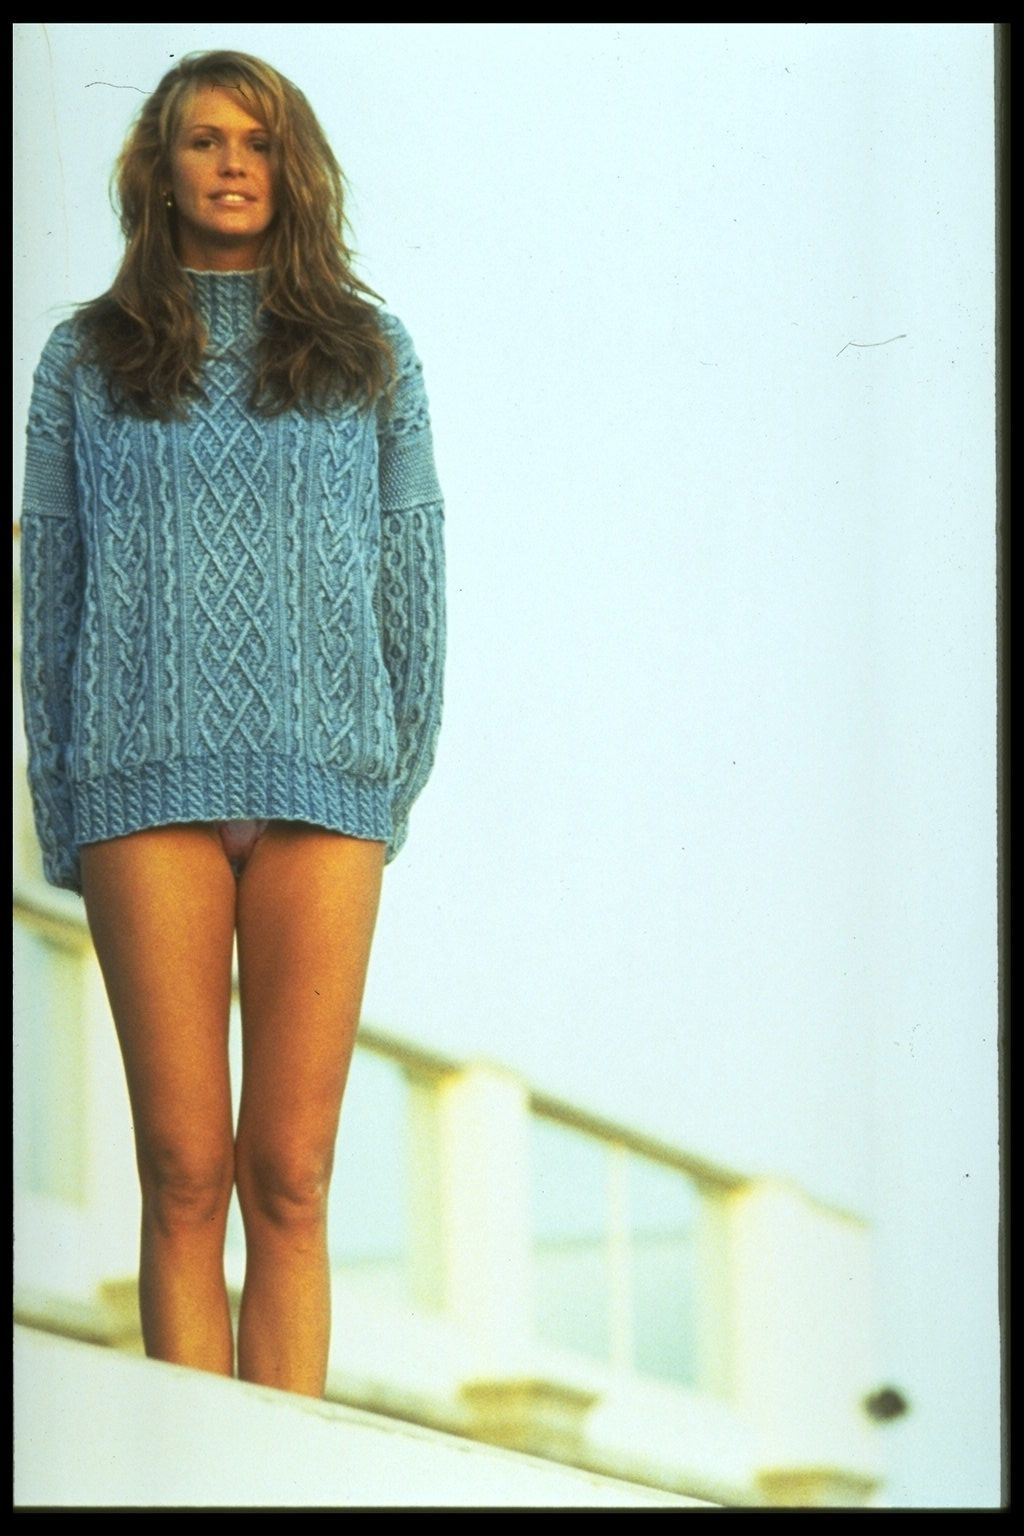 Young Elle Macpherson naked (96 photos), Topless, Paparazzi, Instagram, in bikini 2006